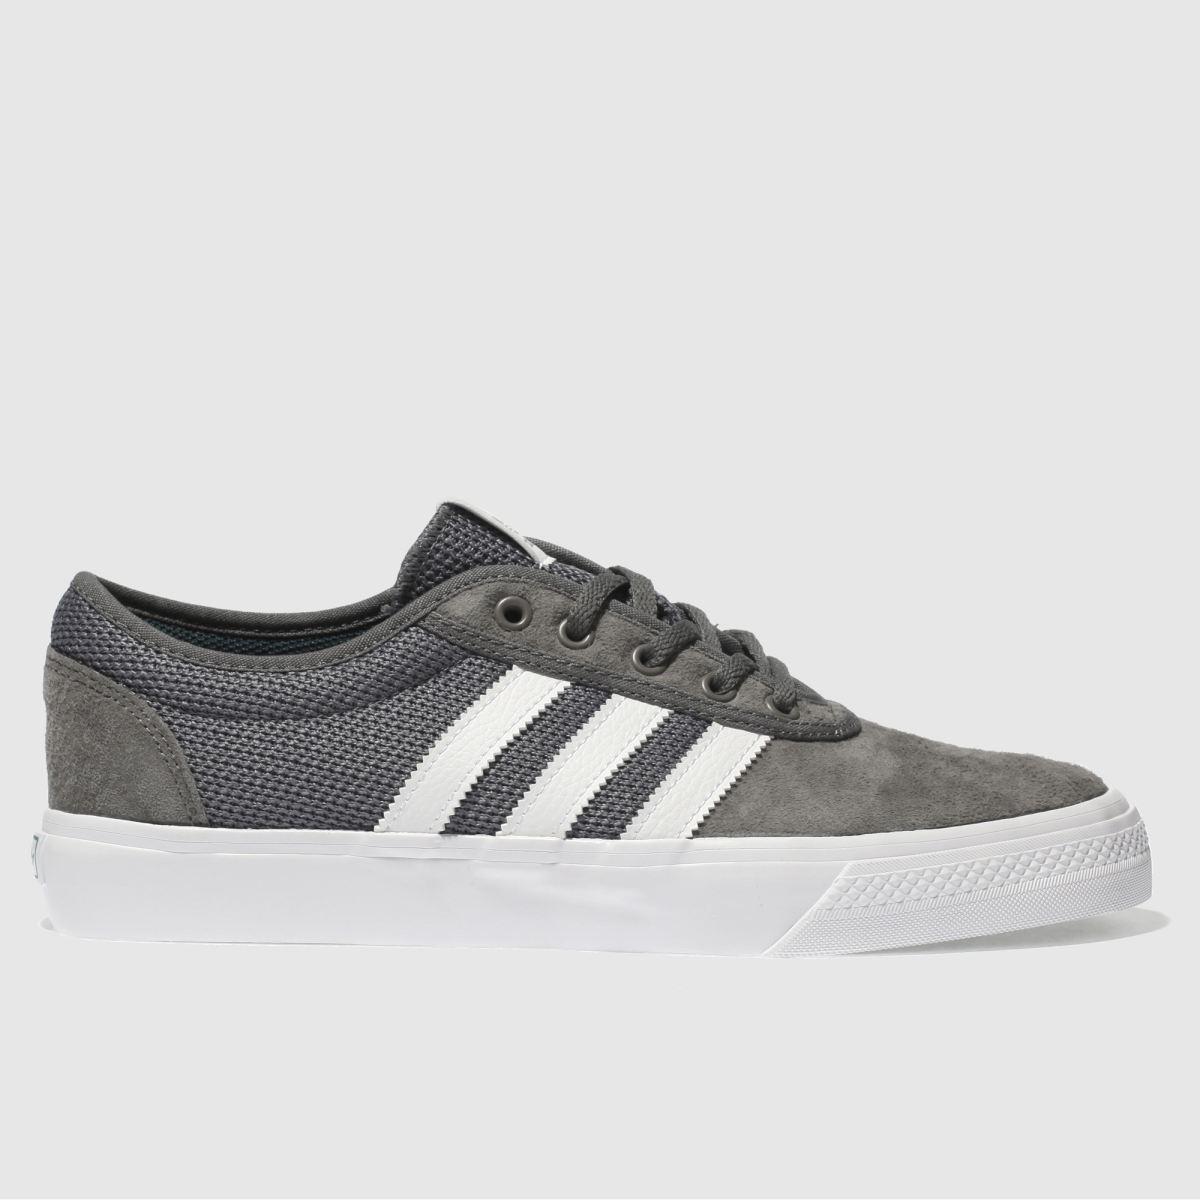 Adidas Skateboarding Grey Adi-ease Trainers